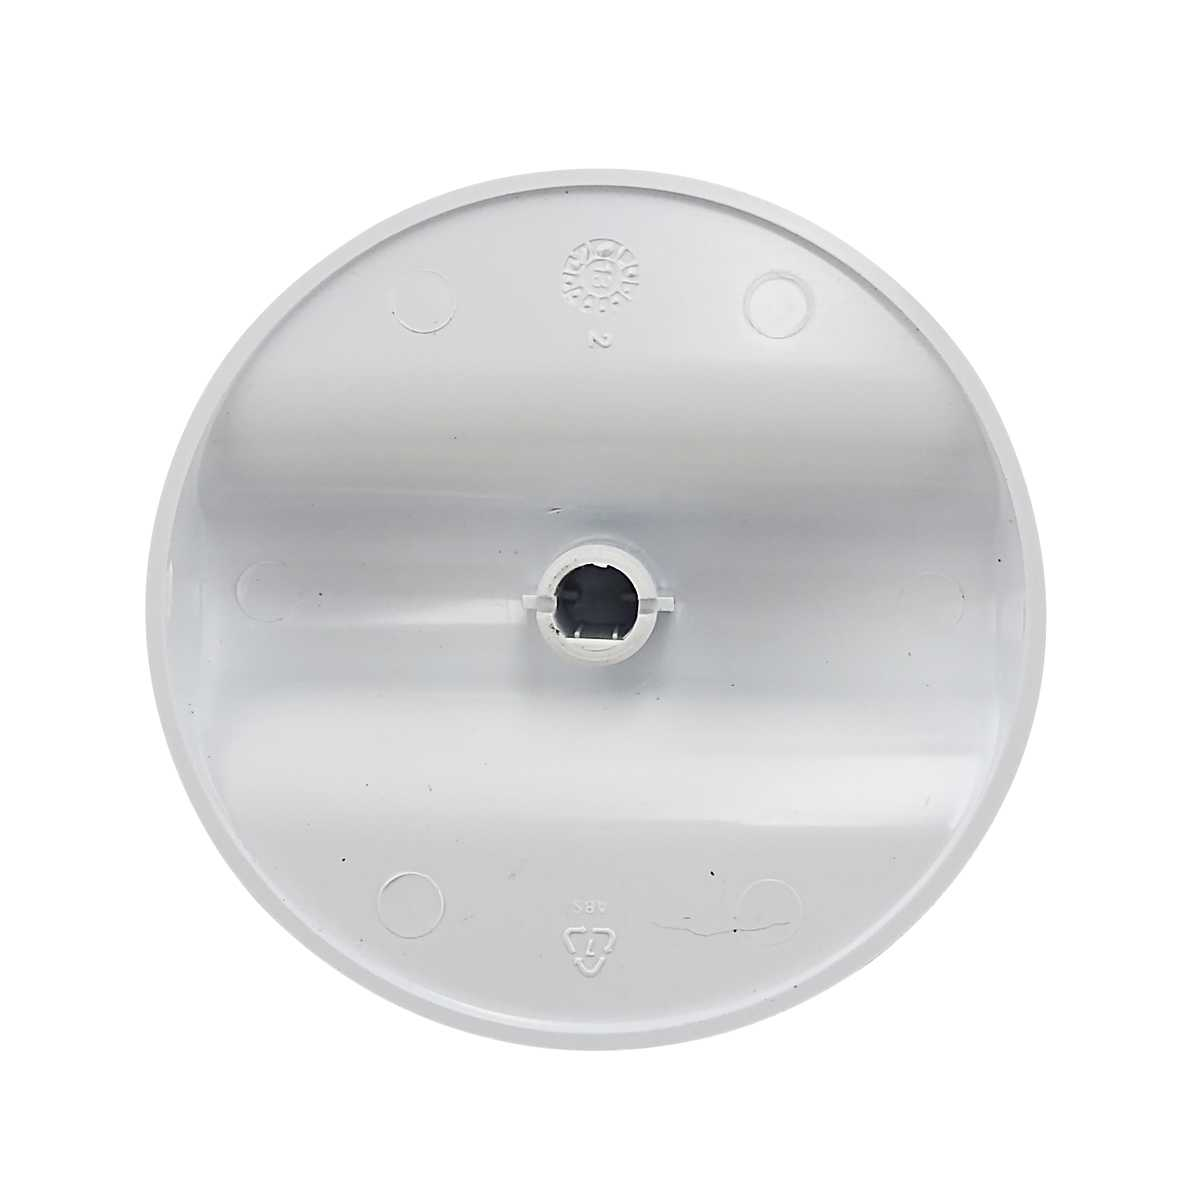 Botão lavadora Electrolux LT60 LTE06 LTE07 LTE09 LTE12